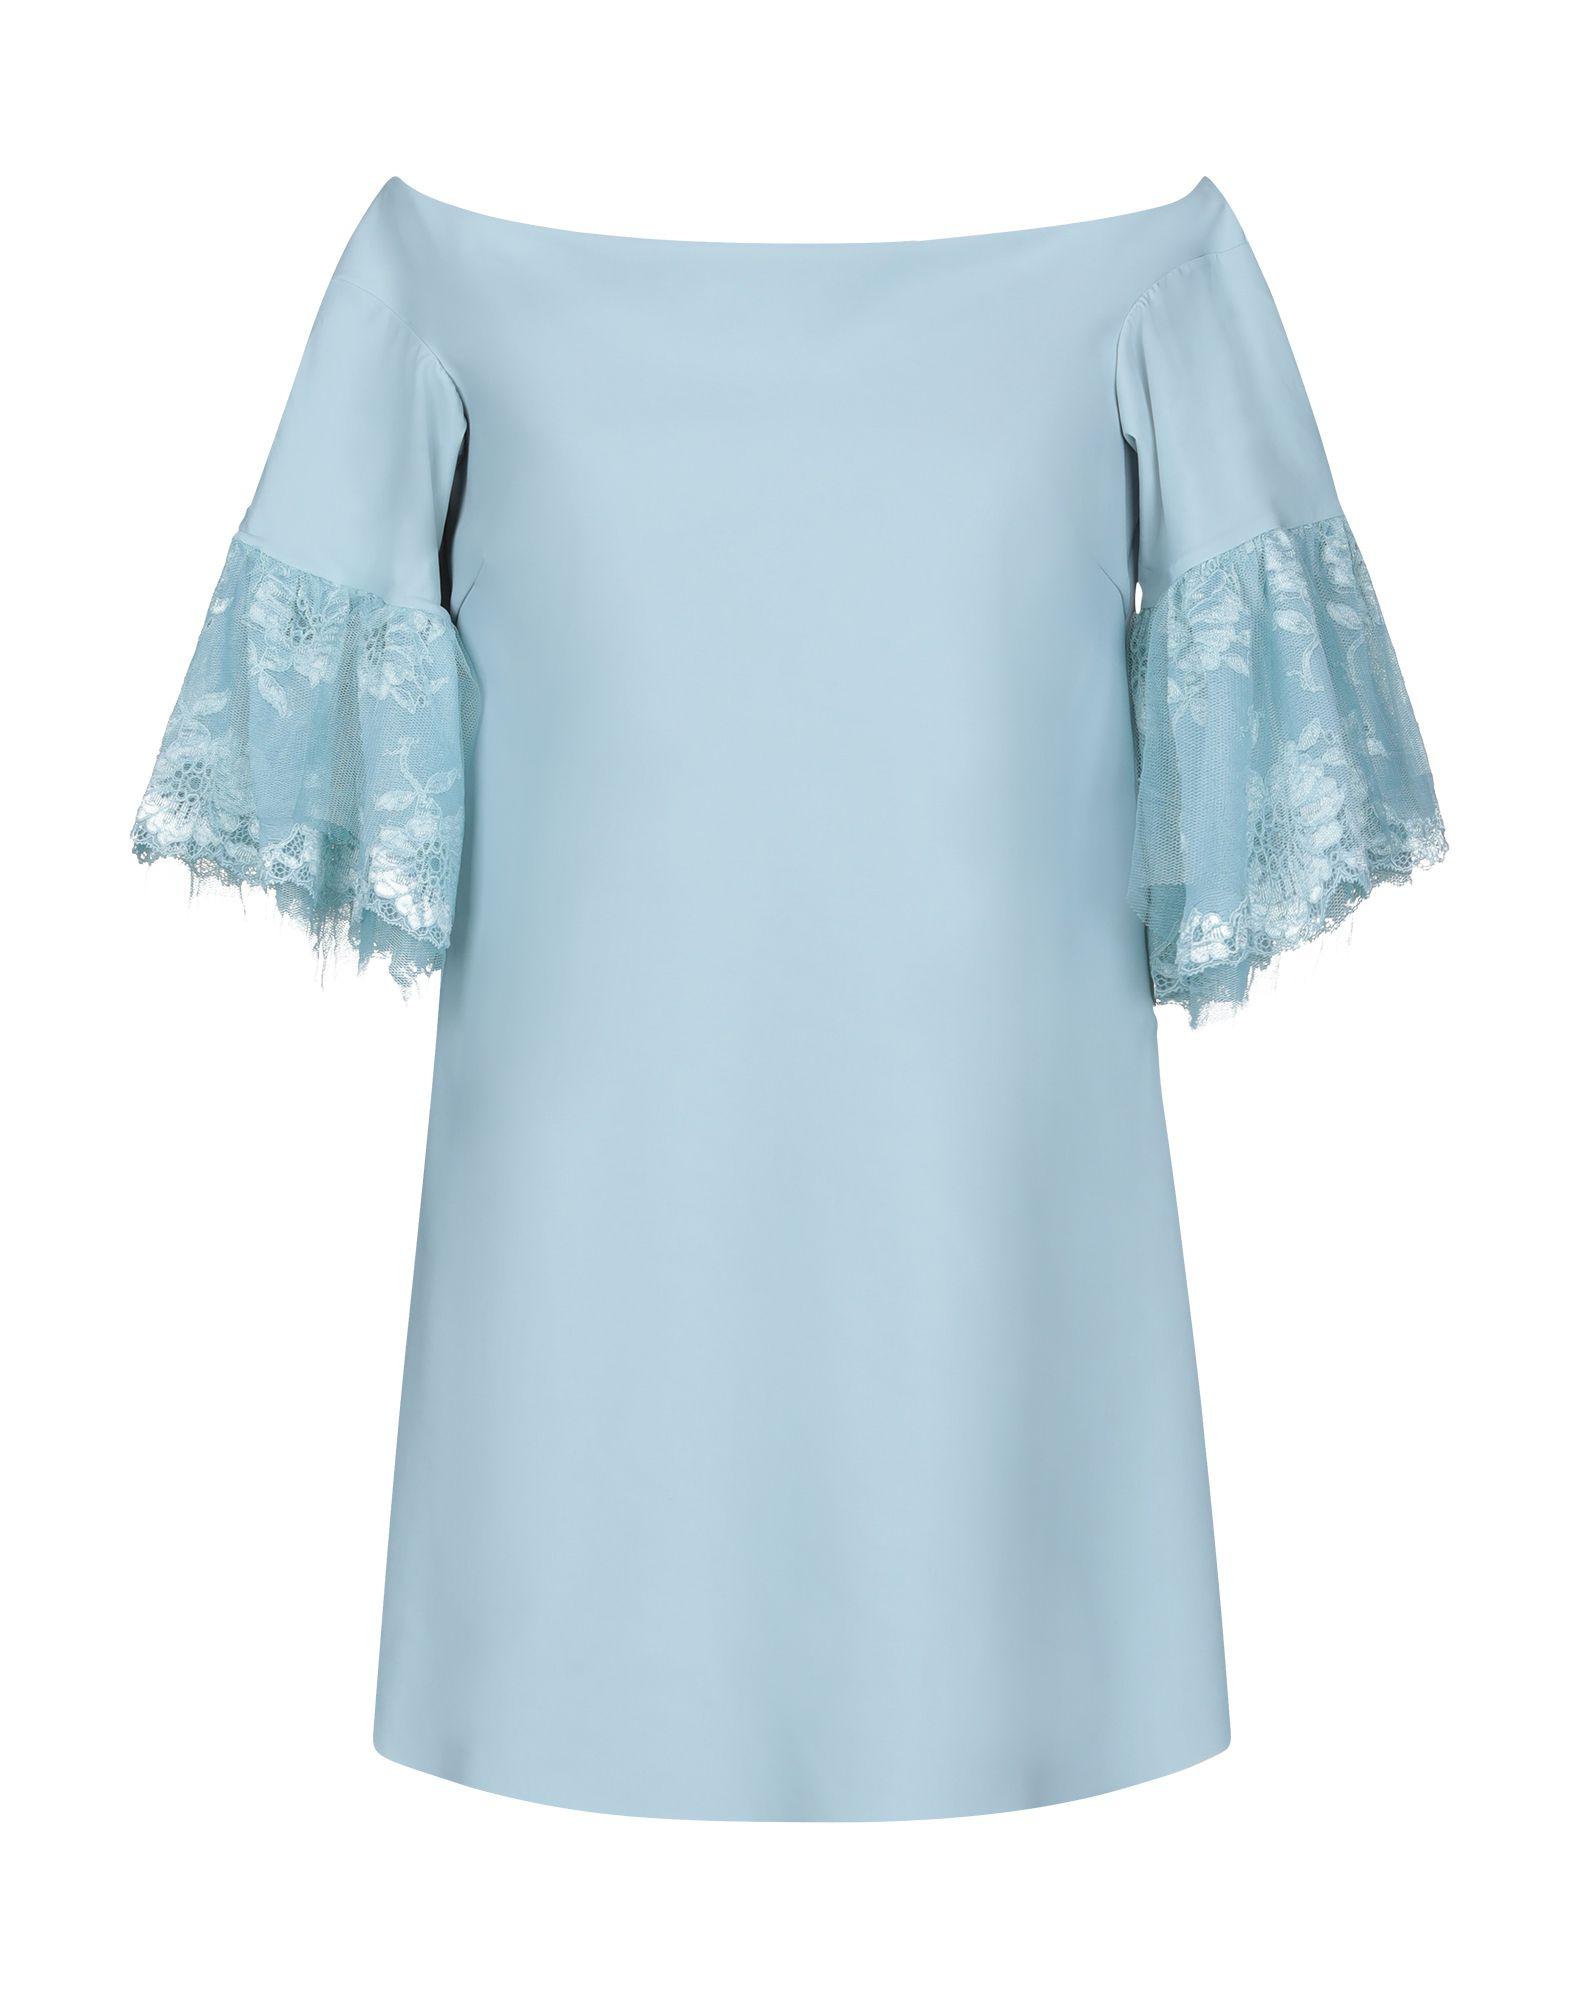 CHIARA BONI LA PETITE ROBE Блузка блузка женская la via estelar цвет зеленый 33951 размер 52